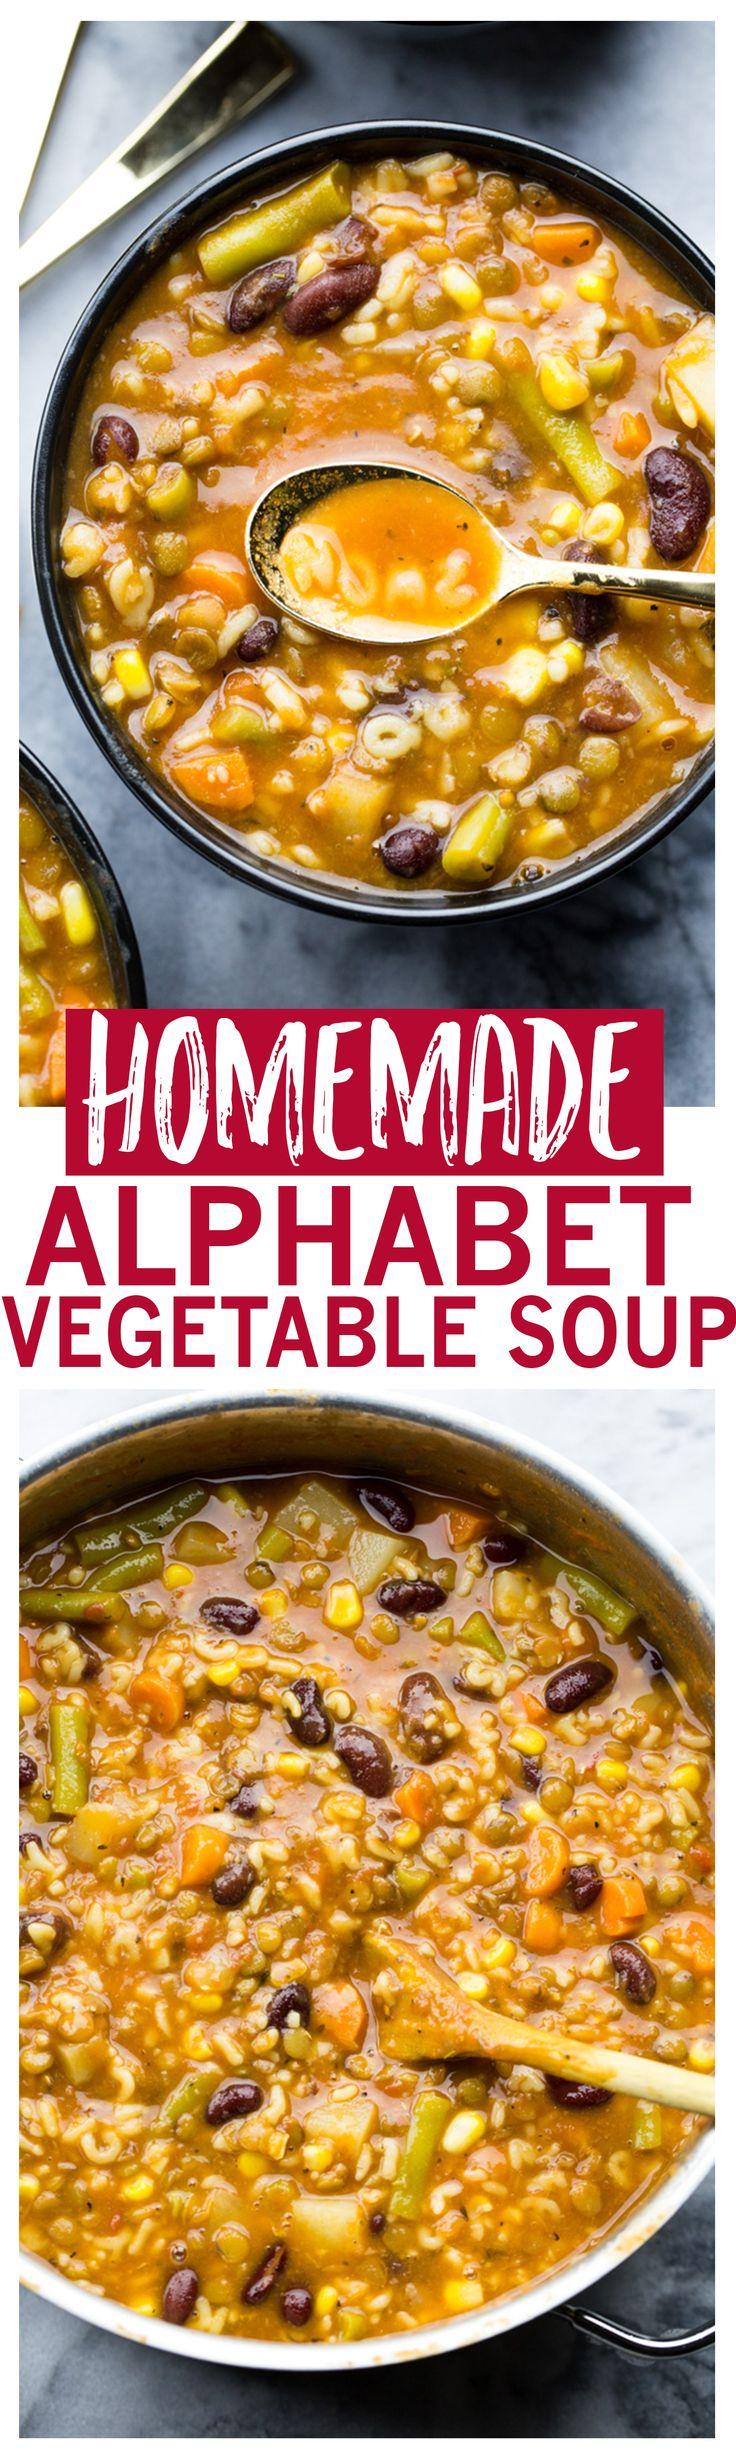 Homemade Alphabet Vegetable Soup | Hearty, vegan, freezer-friendly